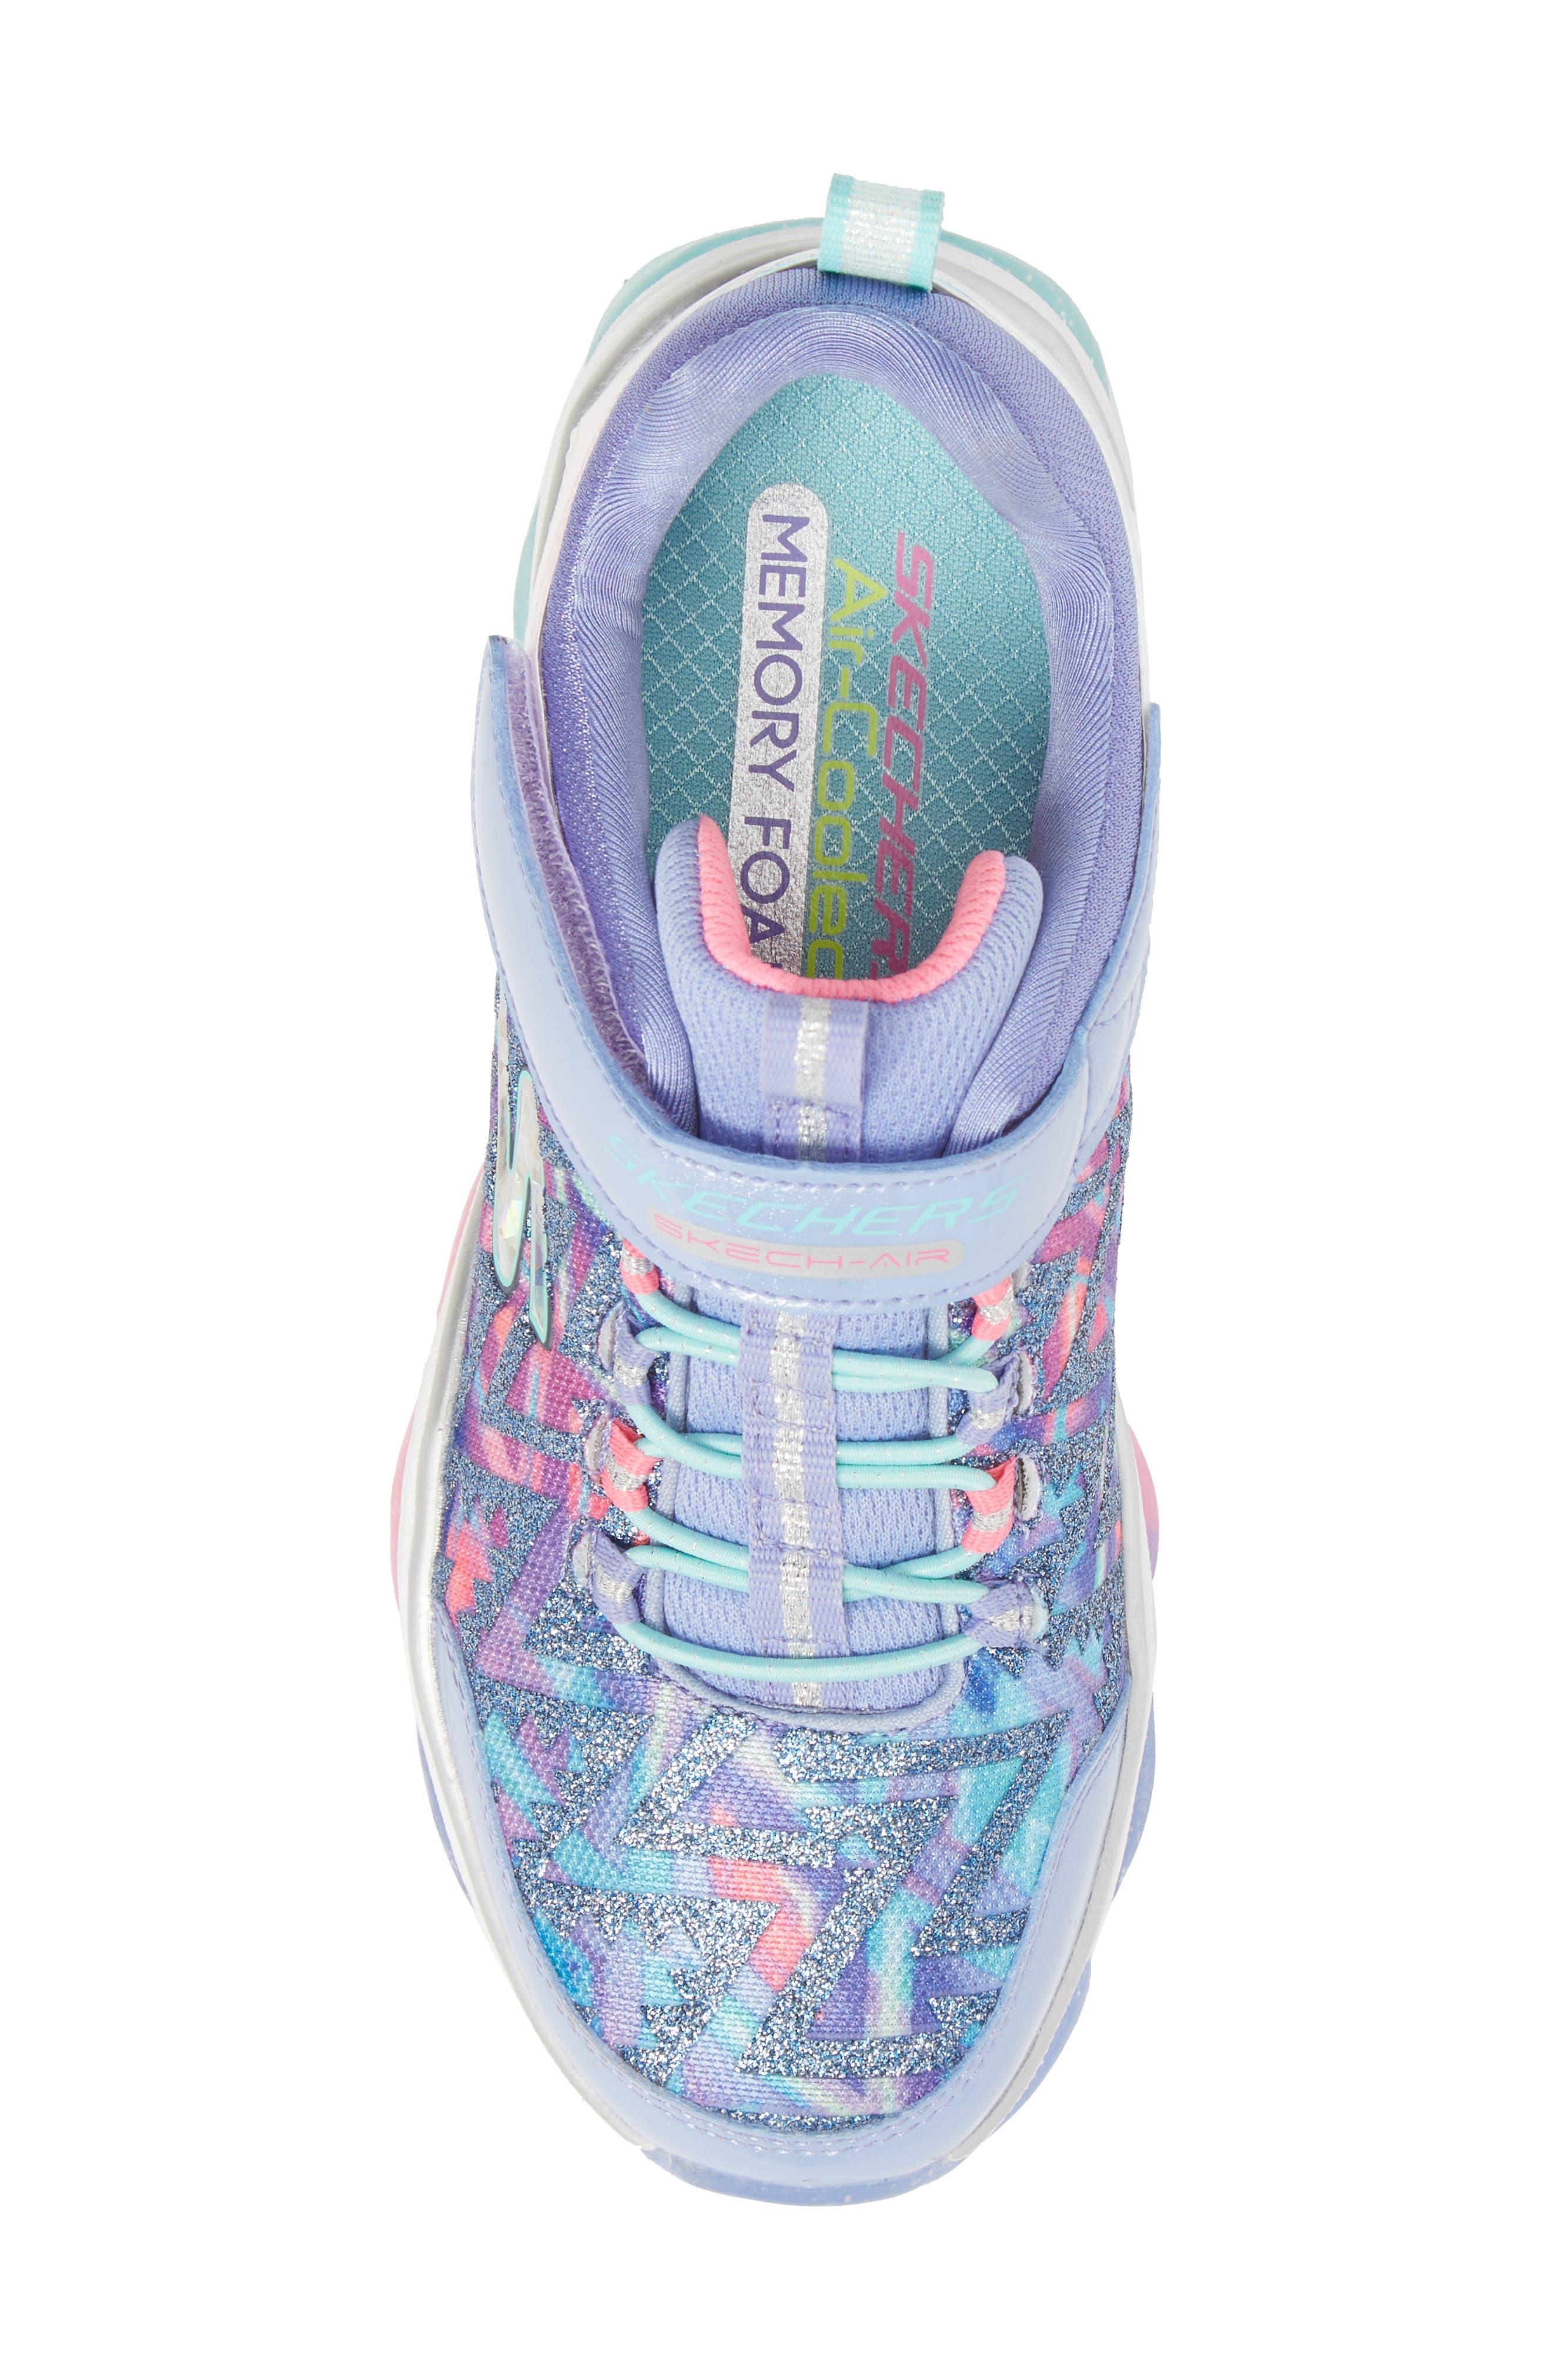 Skech-Air Groove Glitter N Go Sneakers,                             Alternate thumbnail 5, color,                             500